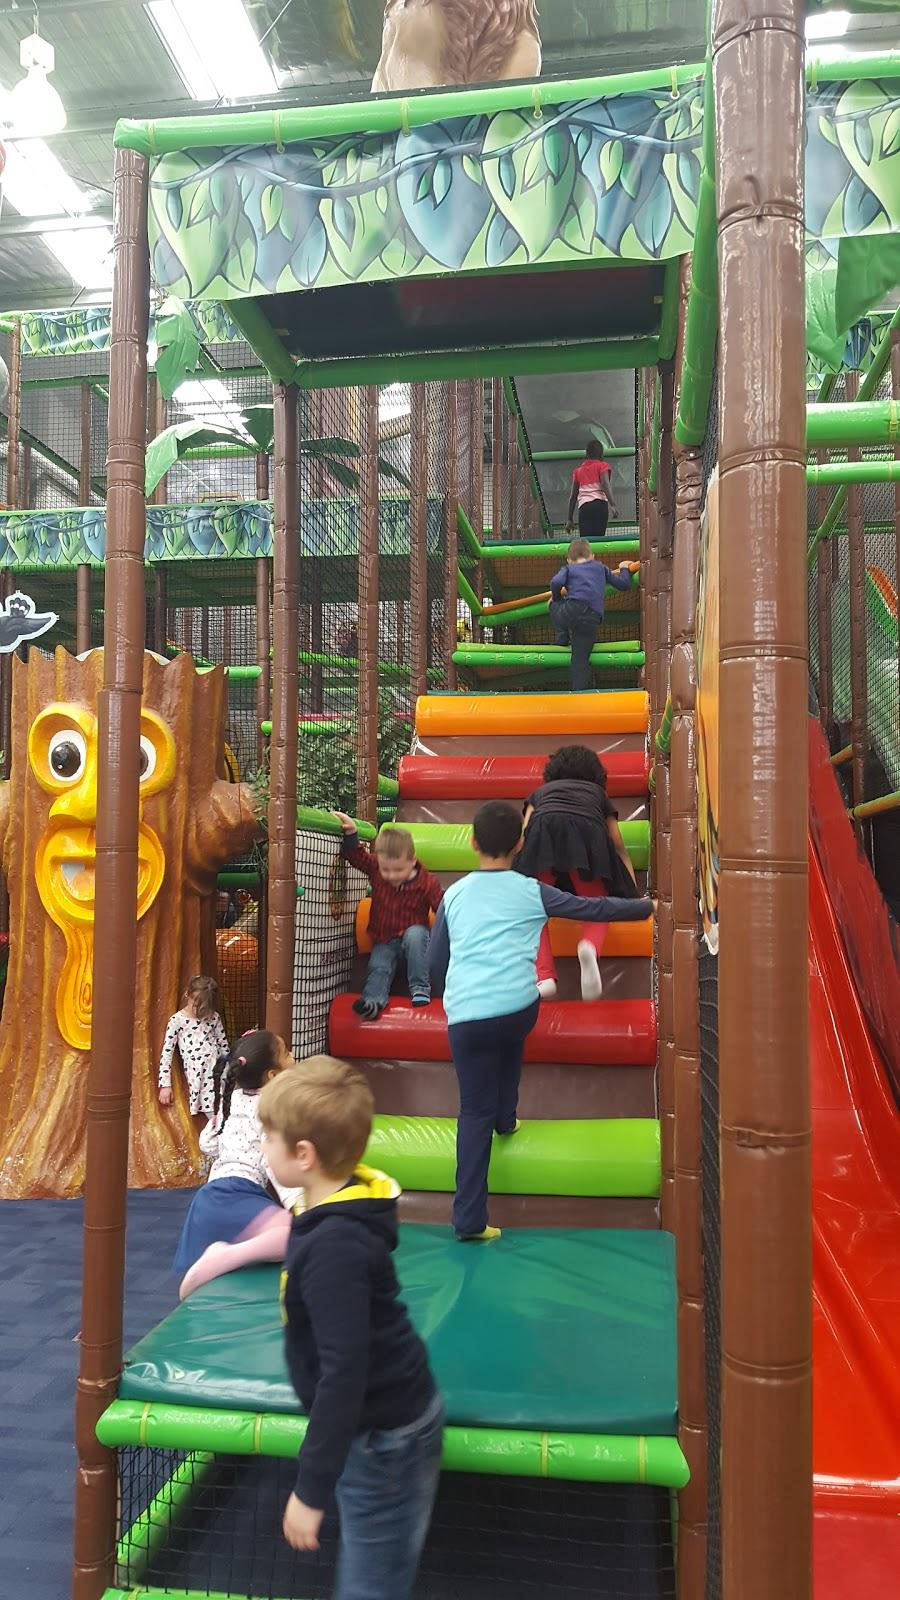 Crocs Playcentre Pakenham | cafe | Unit 10/99 Bald Hill Rd, Pakenham VIC 3810, Australia | 0359412288 OR +61 3 5941 2288